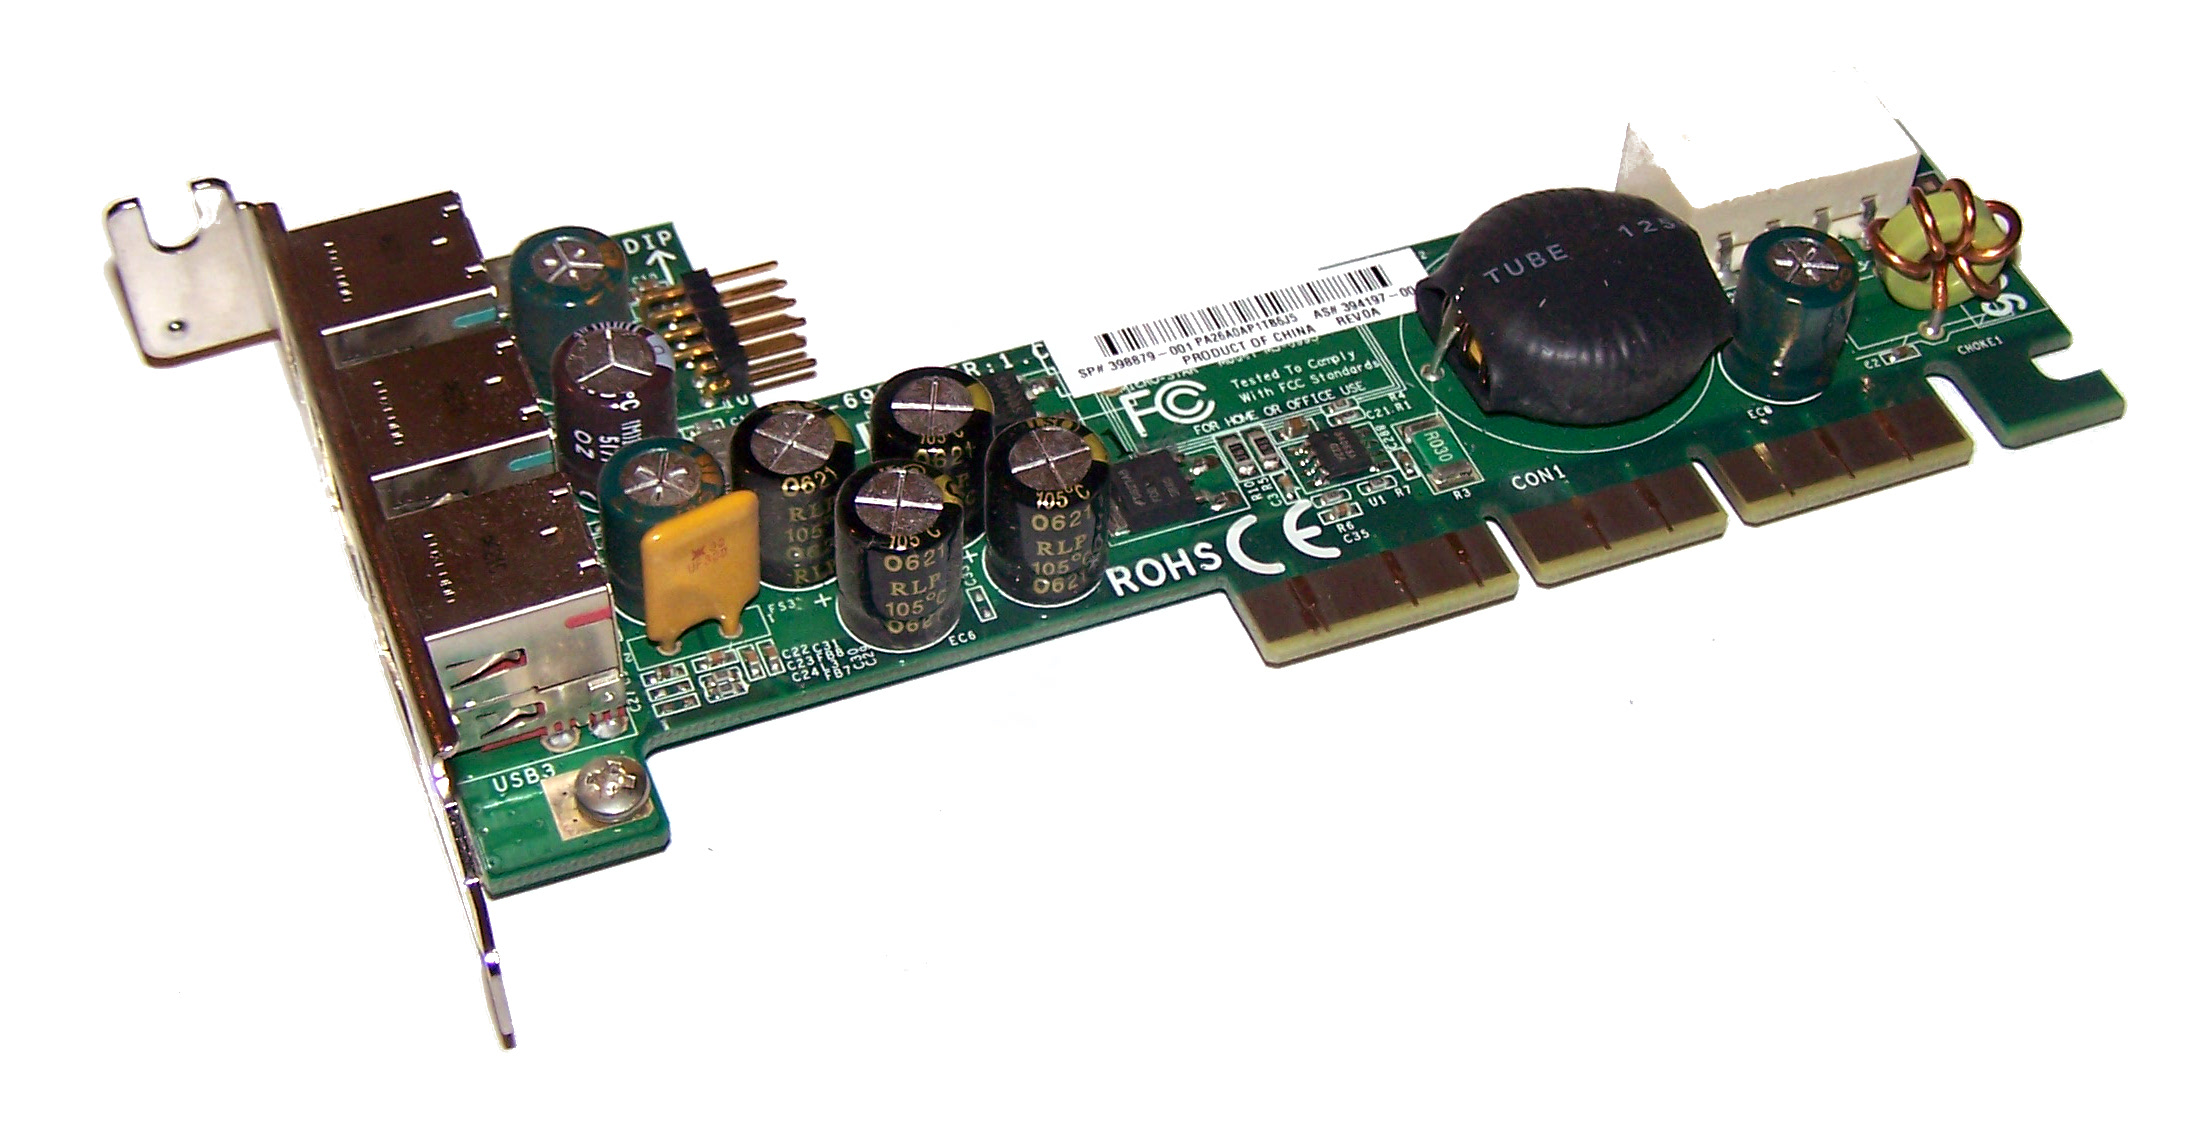 RP5000 POWERED USB PCI BOARD